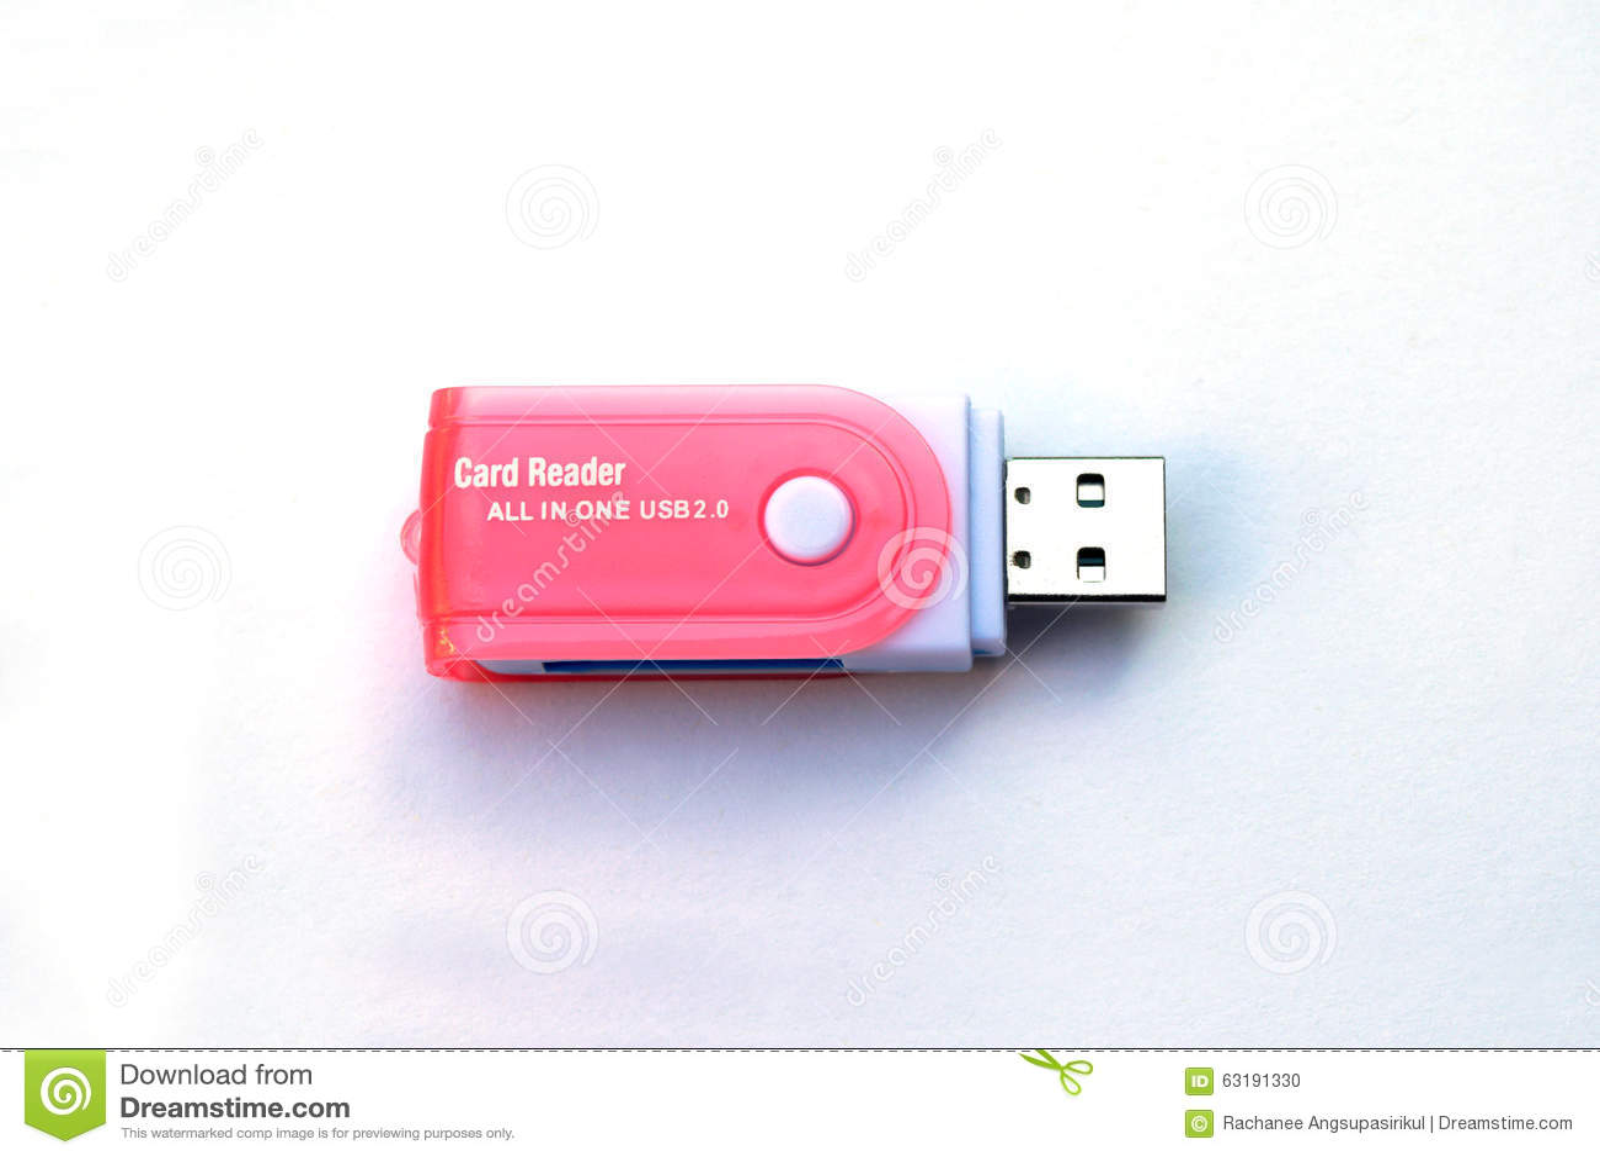 USB Memory Card Reader Stock Photo - Image: 63191330